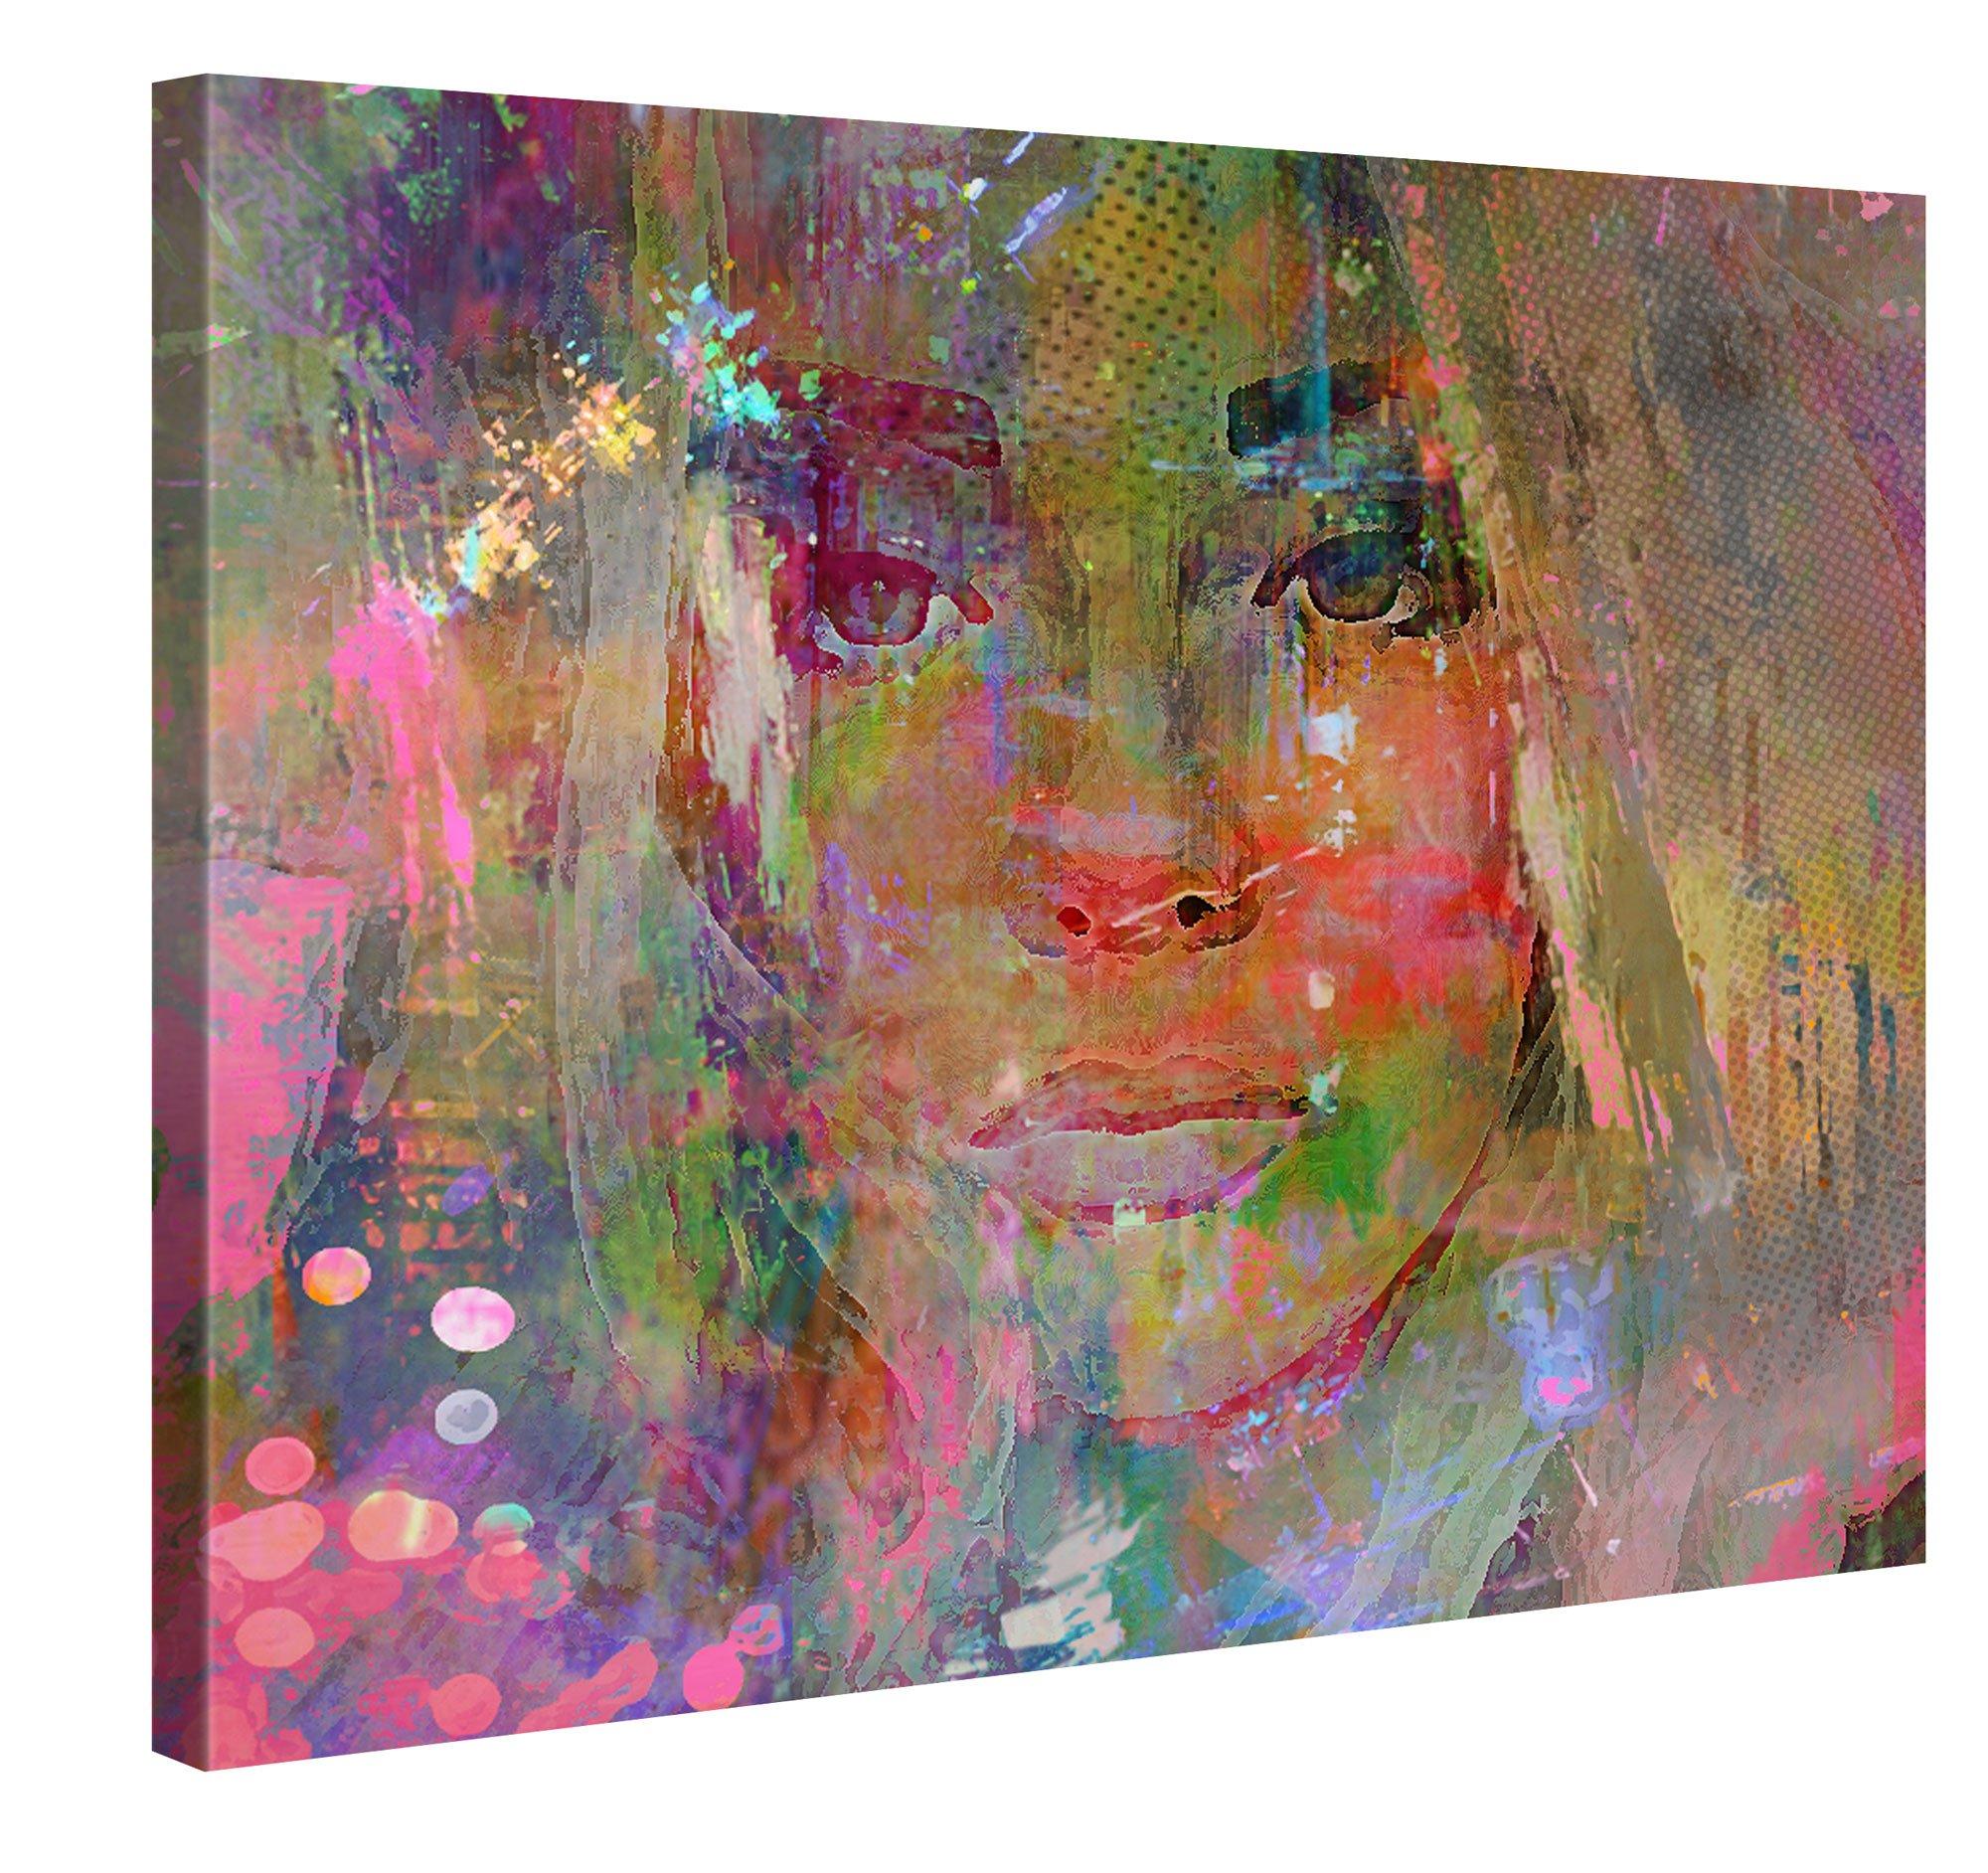 Framed Wall Art: Amazon.co.uk